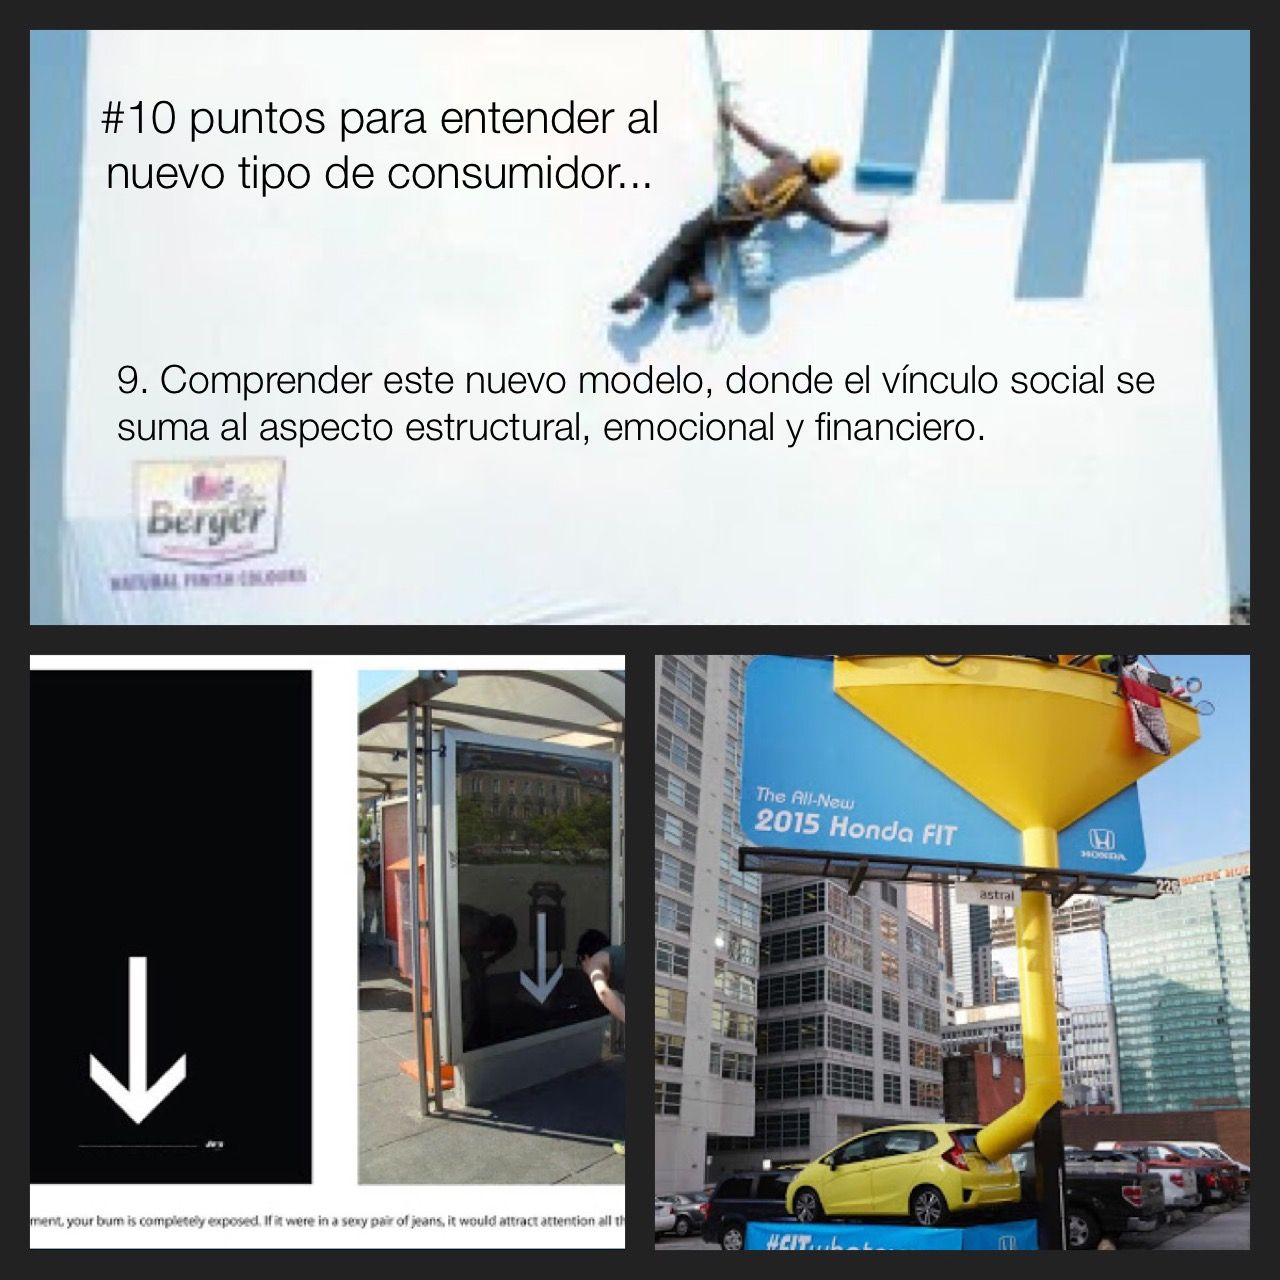 #BetterCallNeto #Design #Diseño #ConsejosEnDiseño #Creativity #Marketing #10PuntosParaEntenderAlNuevoTipoDeConsumidor www.bettercallneto.com